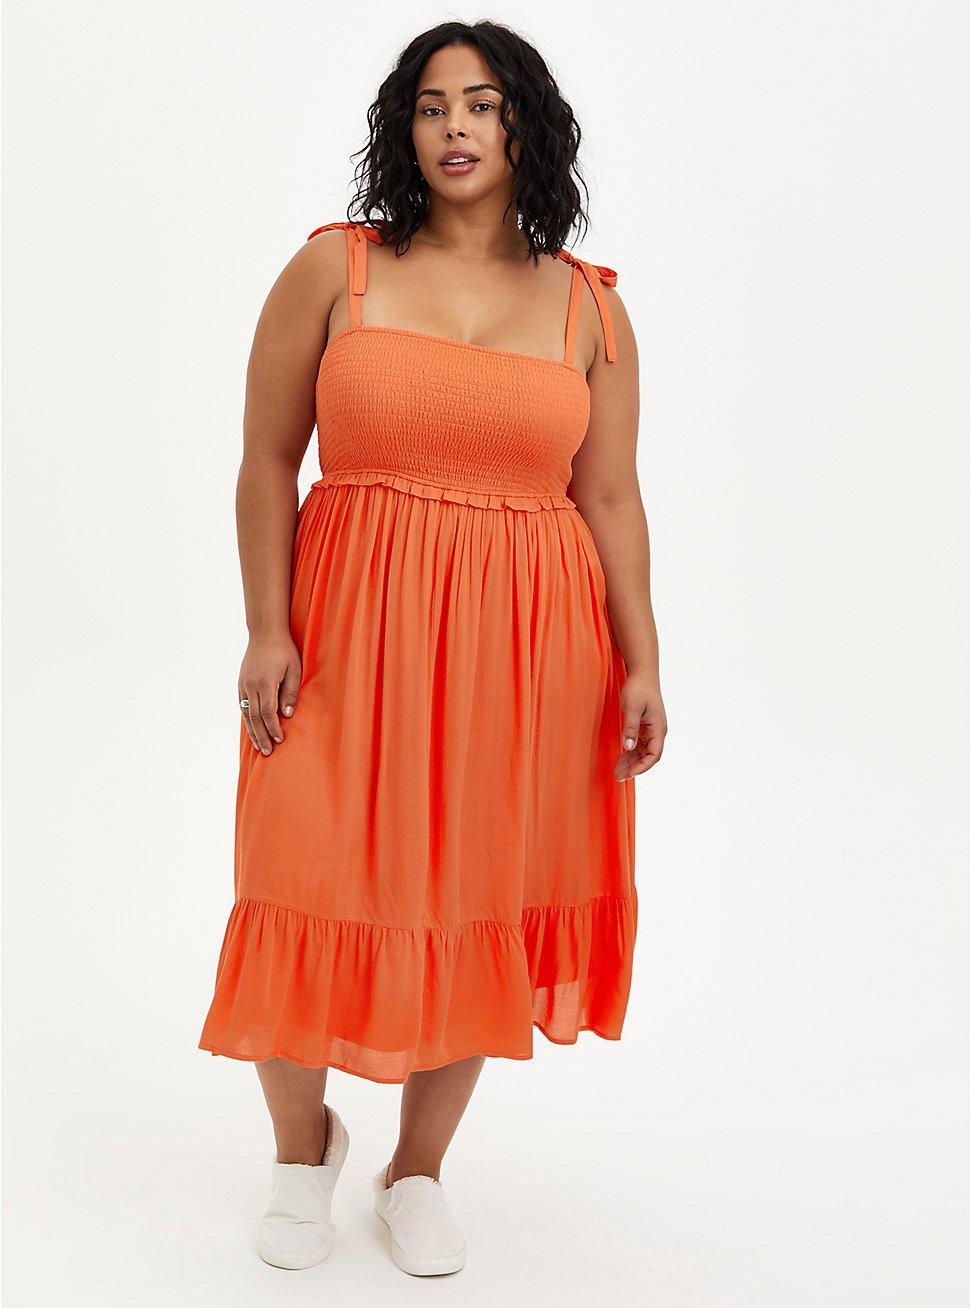 Smocked Tiered Midi Dress - Textured Rayon Orange, , hi-res